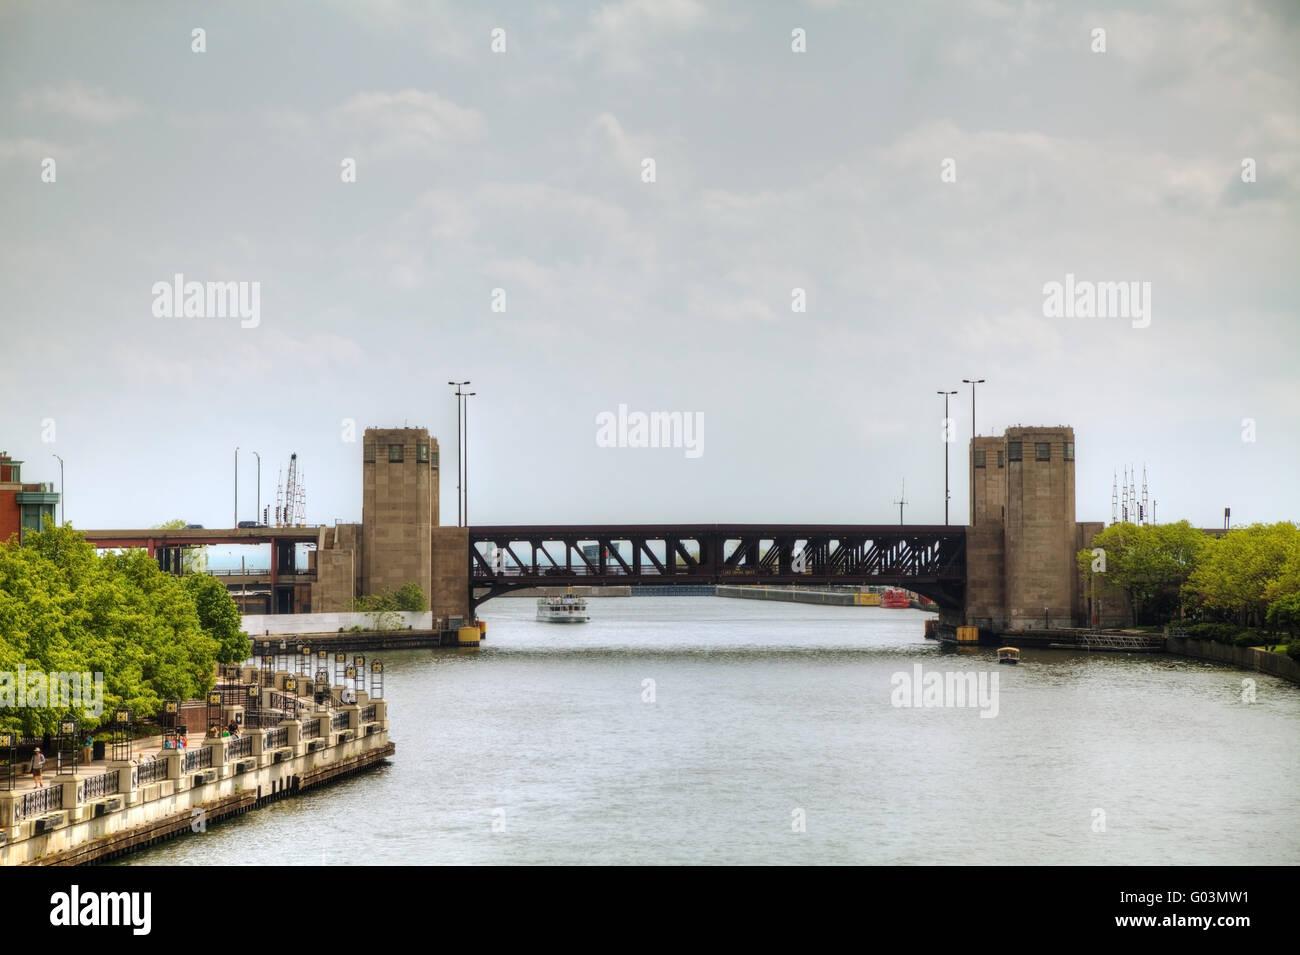 Bridge across river in downtown Chicago, Illinois - Stock Image